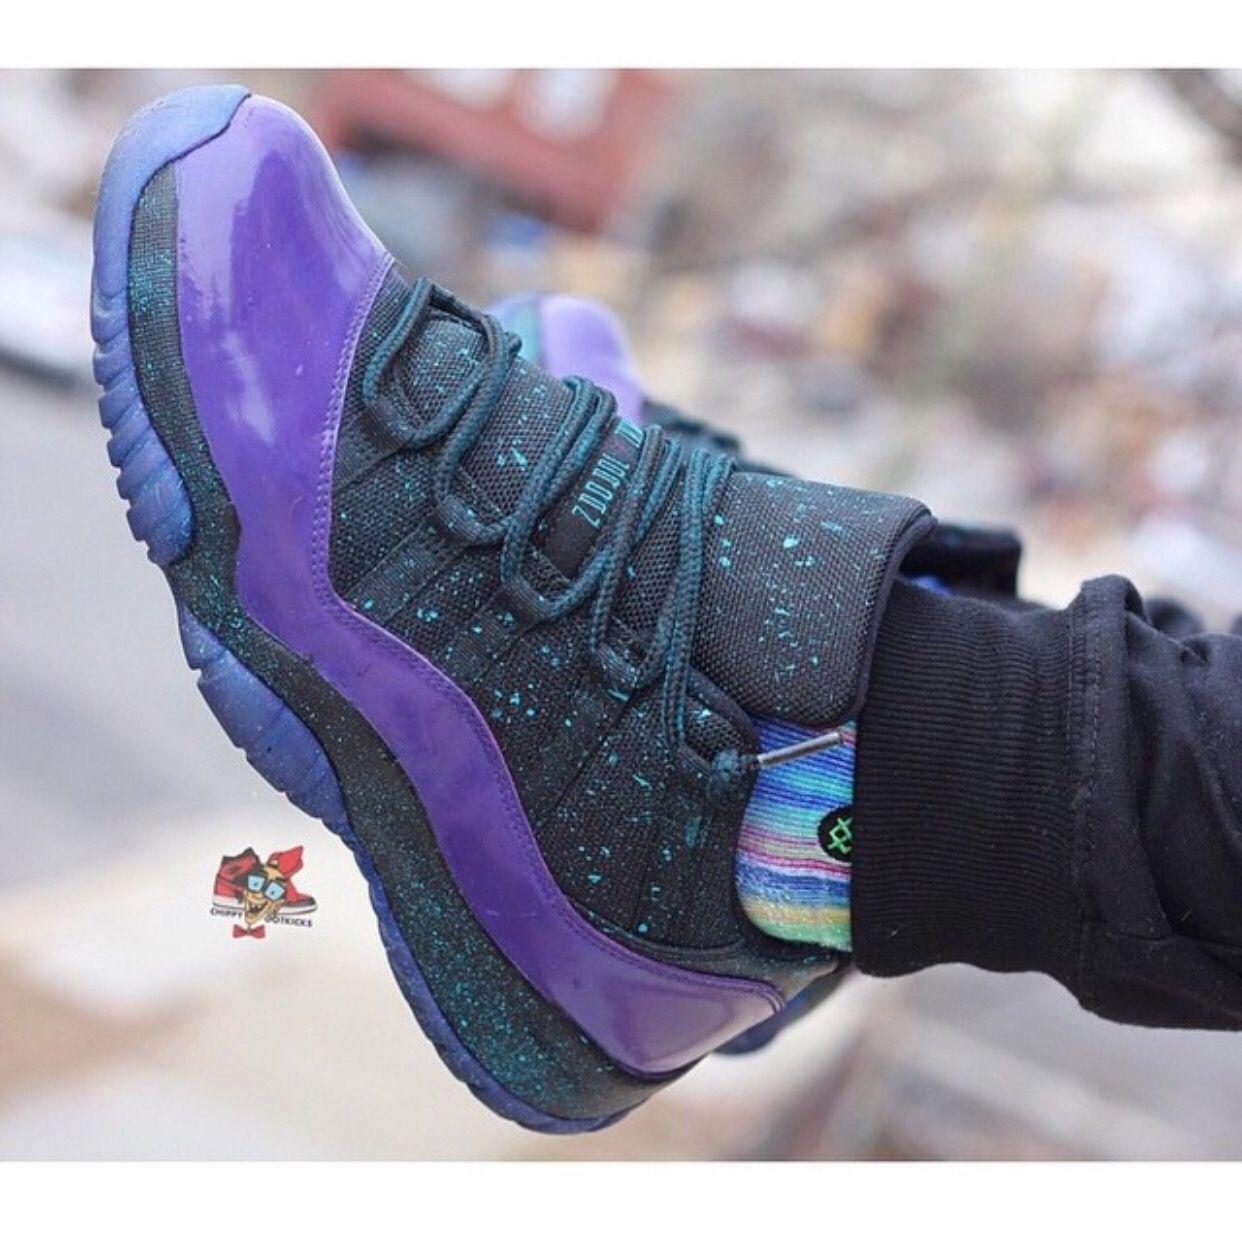 Cheap Nike Air Jordan 11 Low Hologram Custom